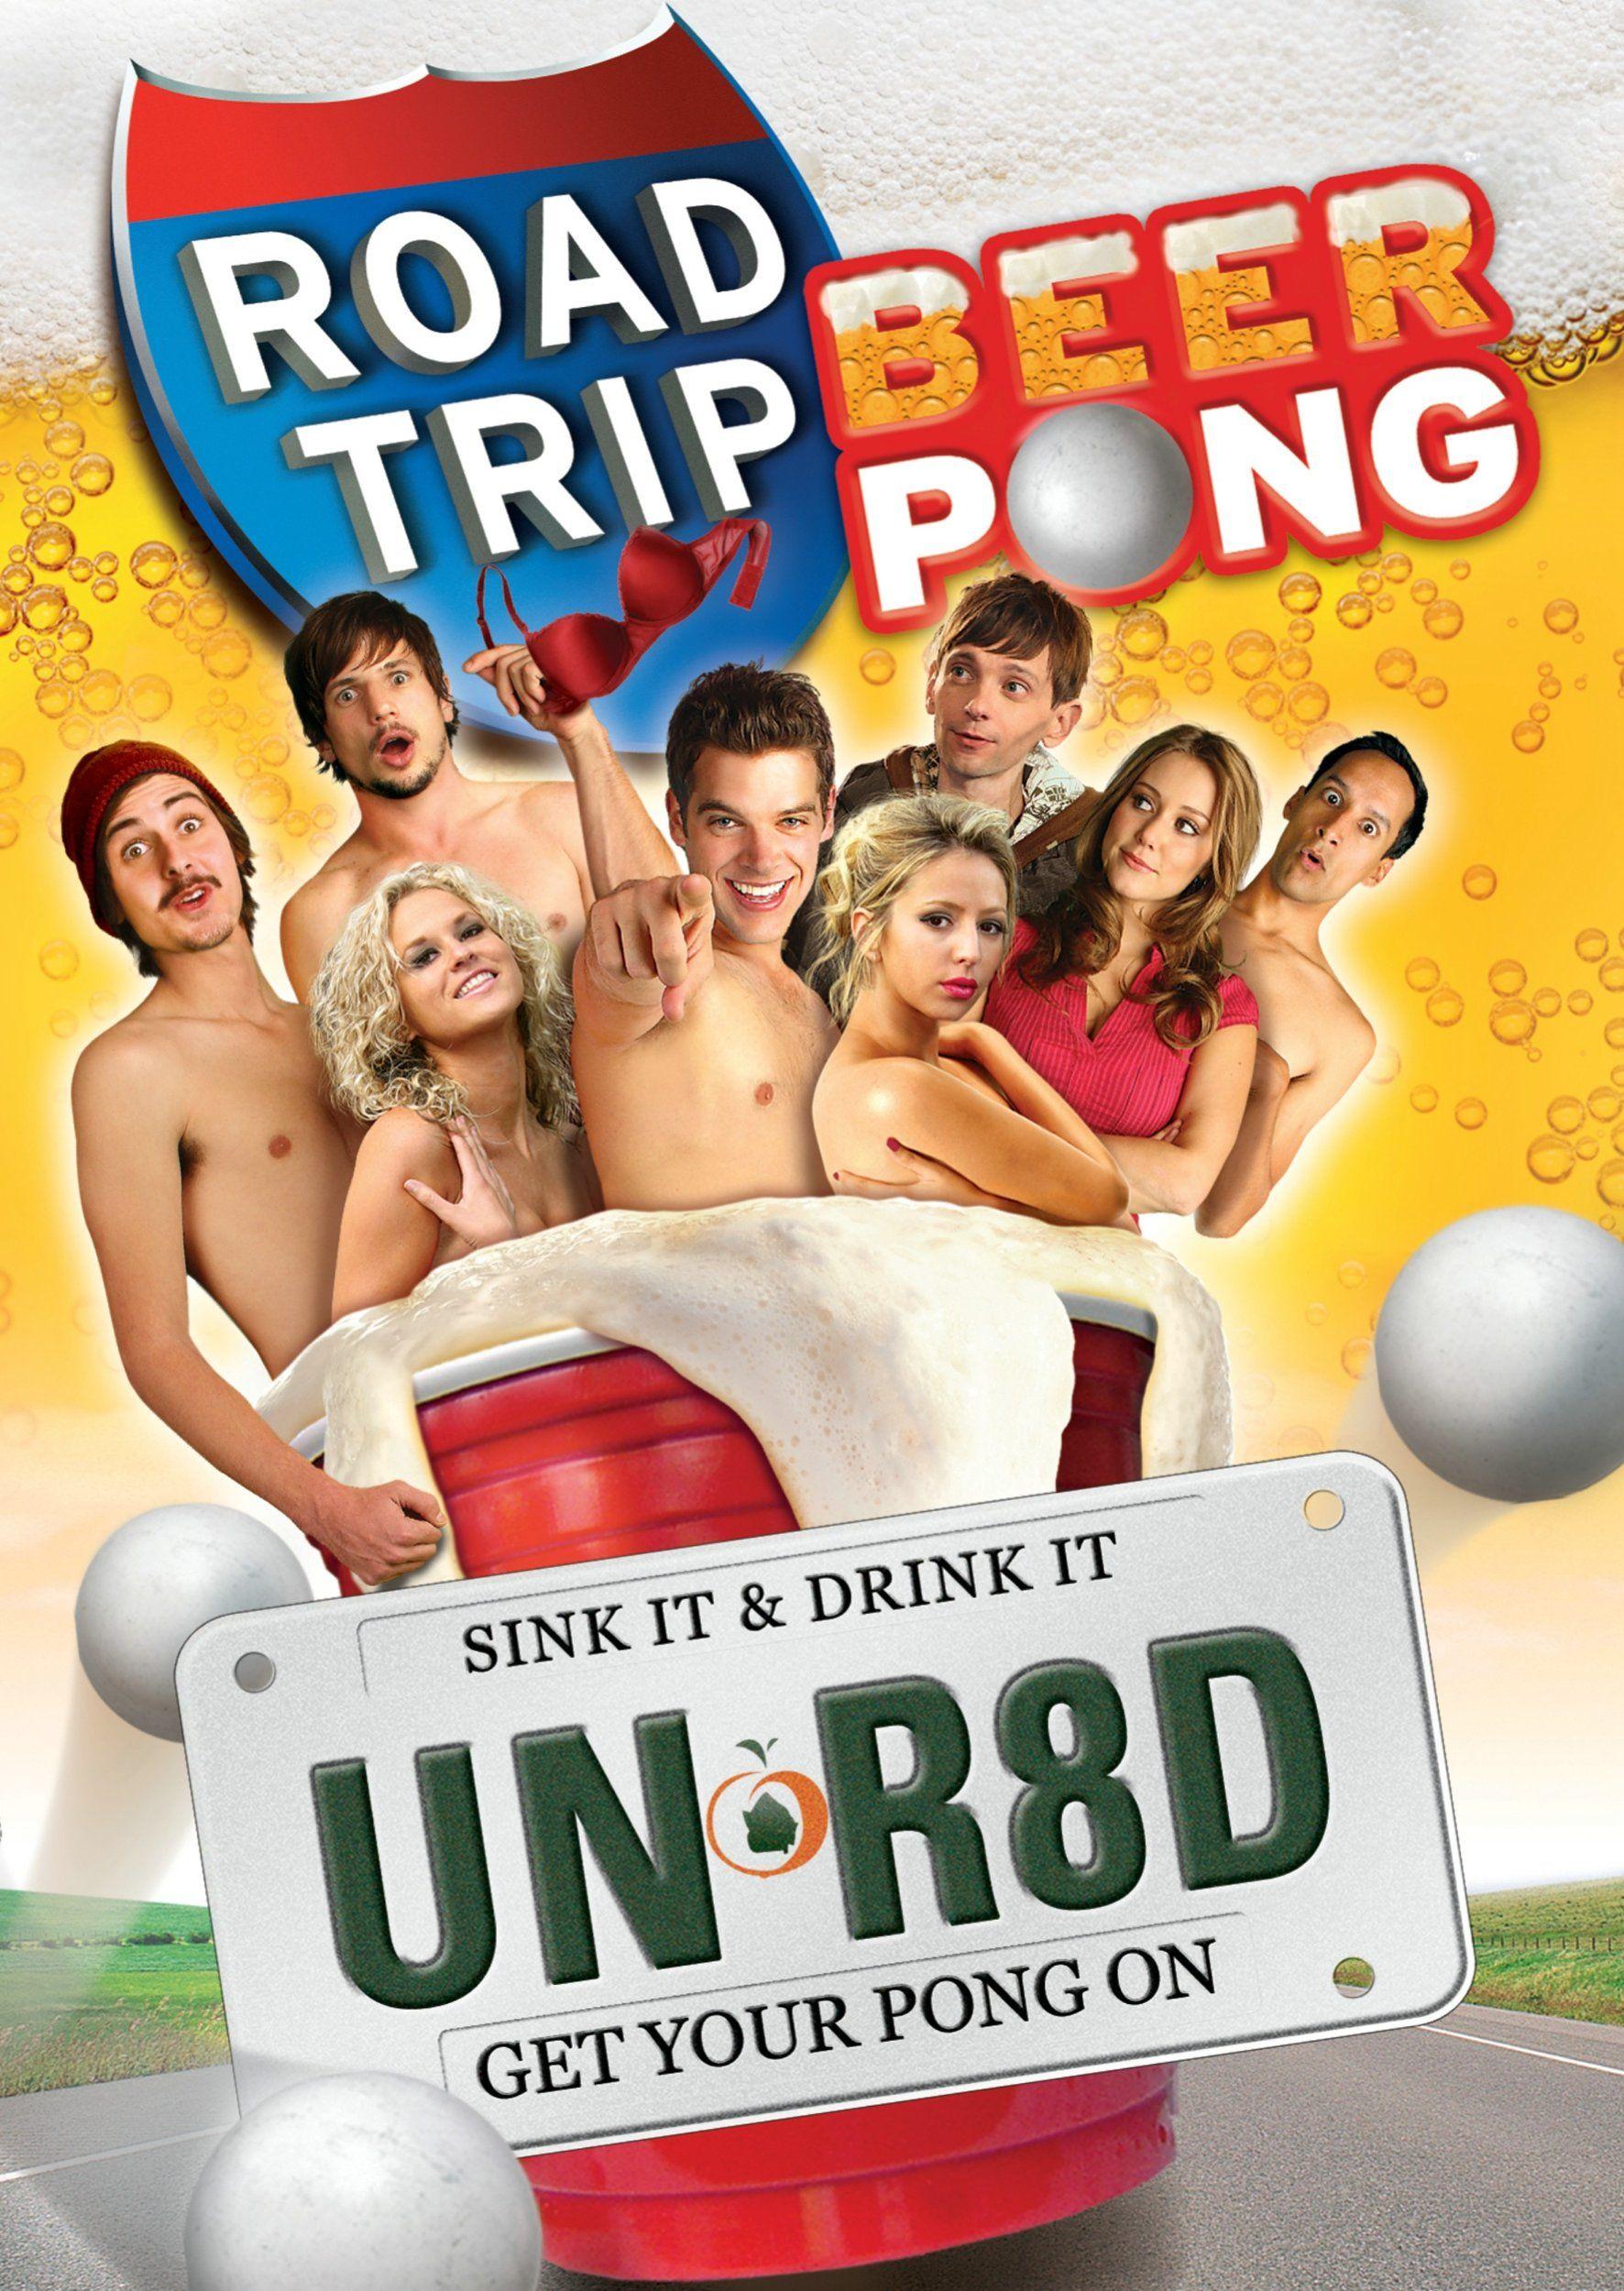 Road Trip Beer Pong Unrated Edition Beer Pong Road Trip Trip